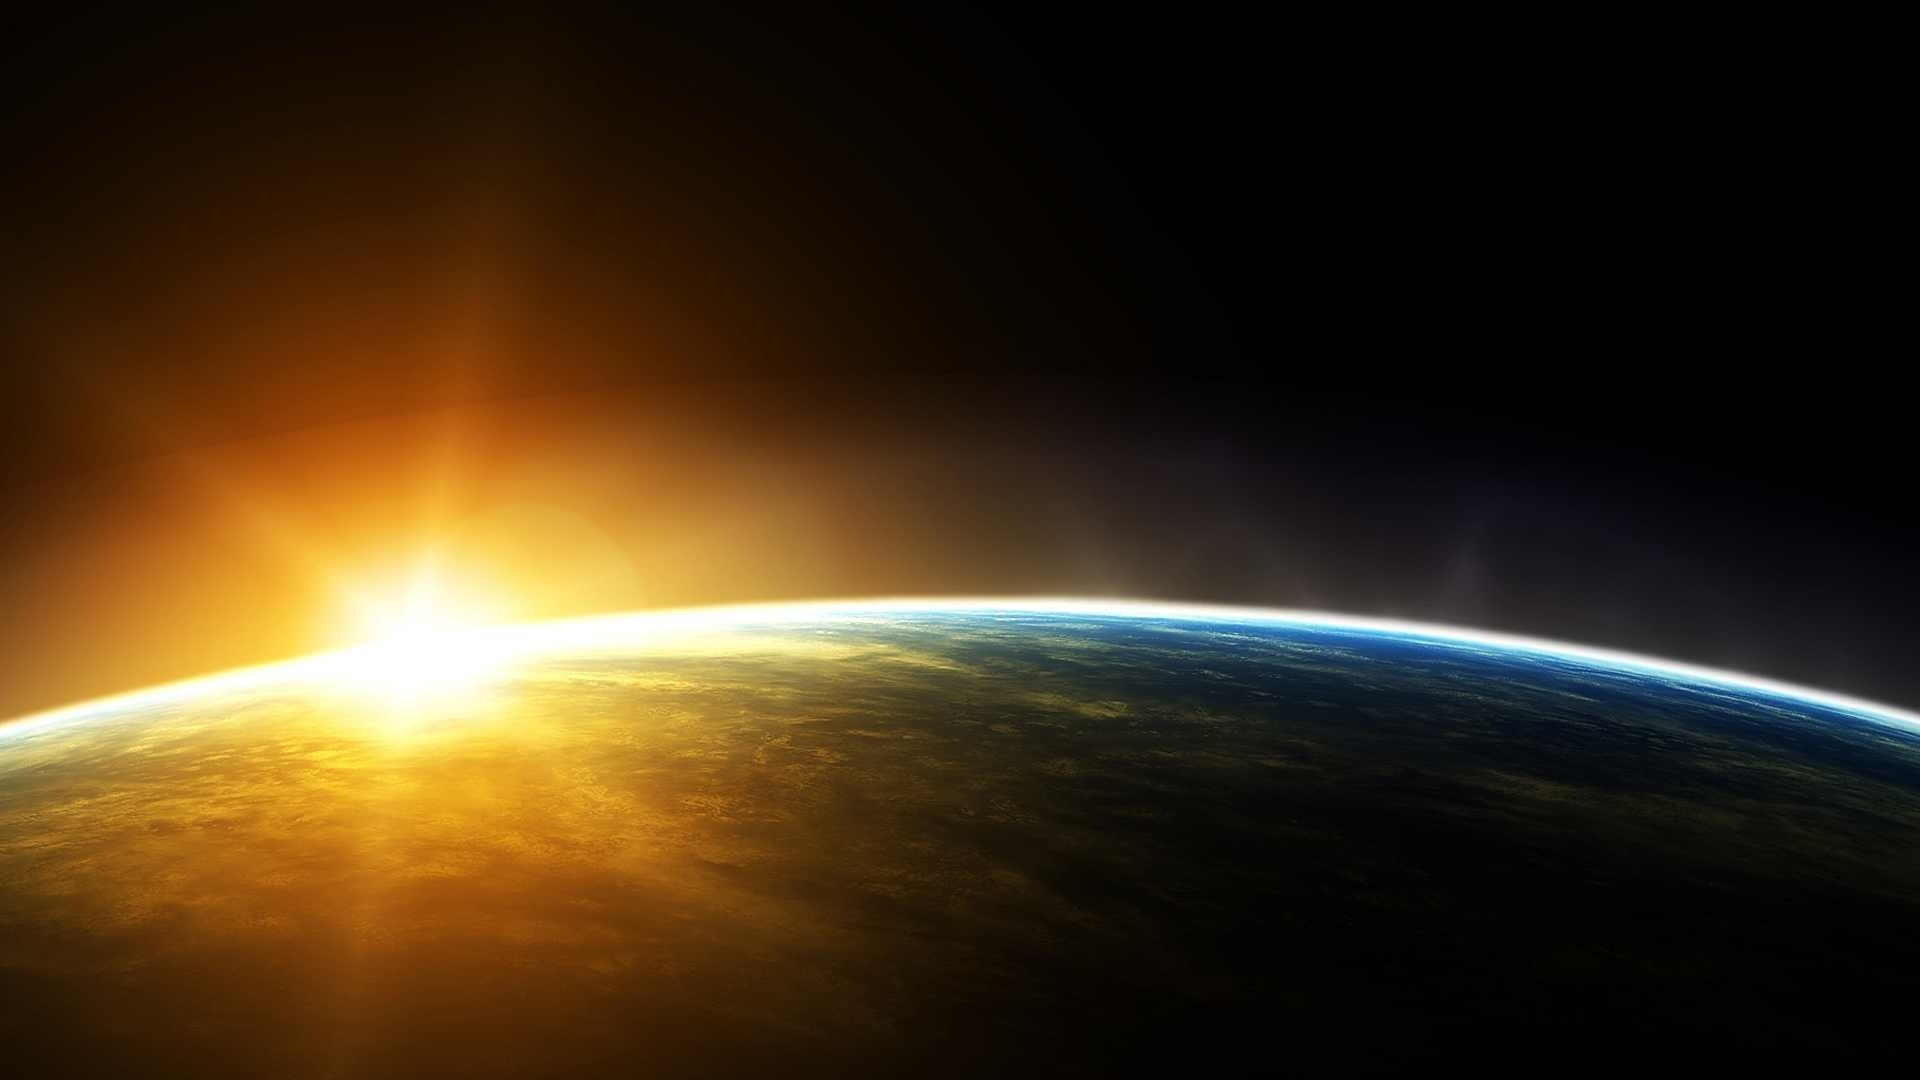 nasa-earth-rounding-sun-high-wallpapers